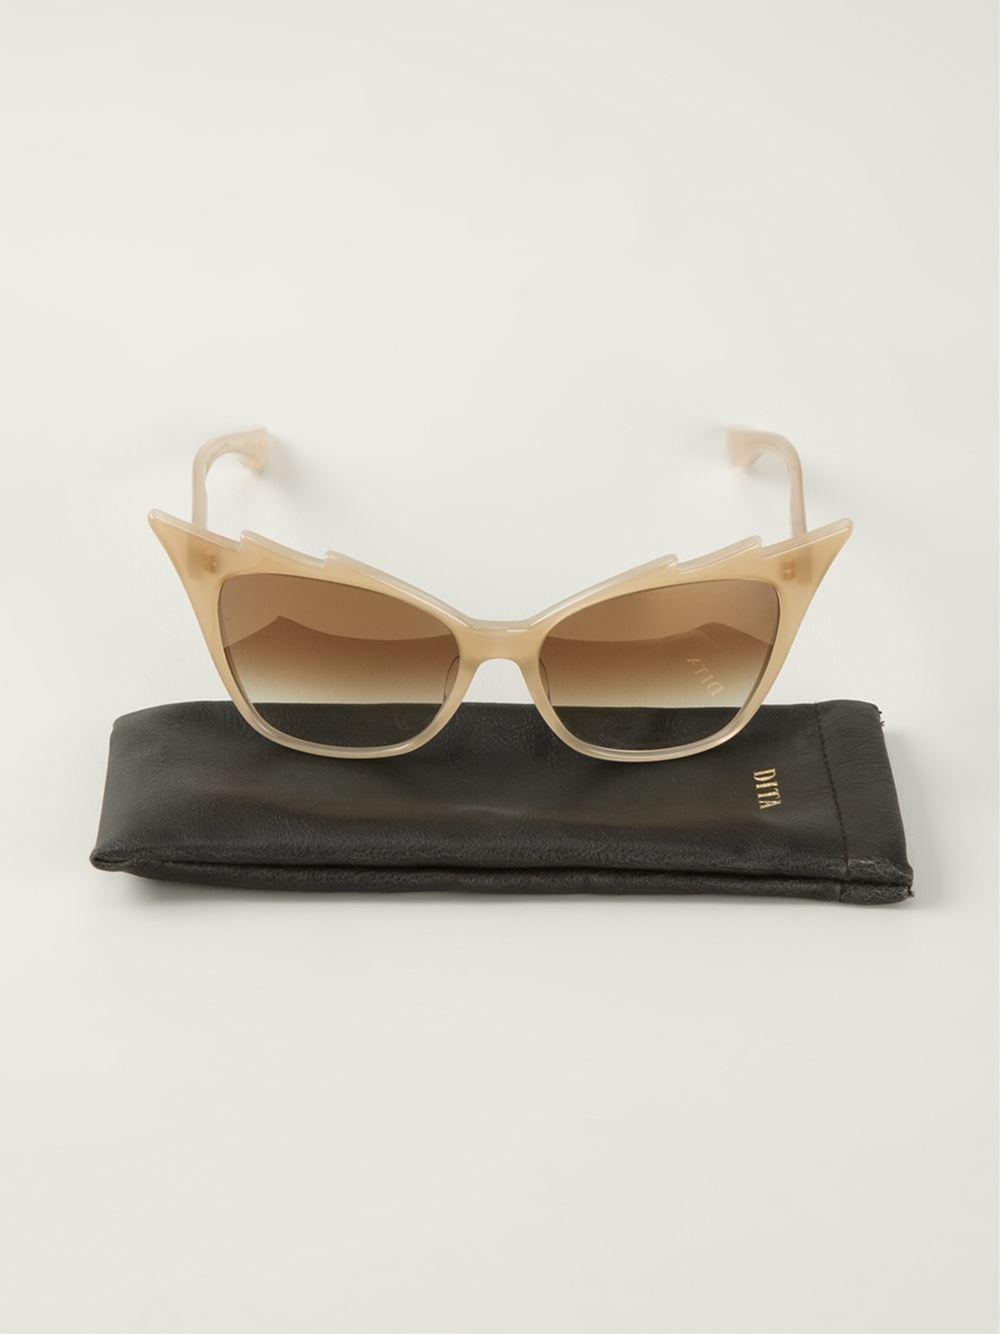 Dita Eyewear 'Hurricane' Sunglasses in Natural